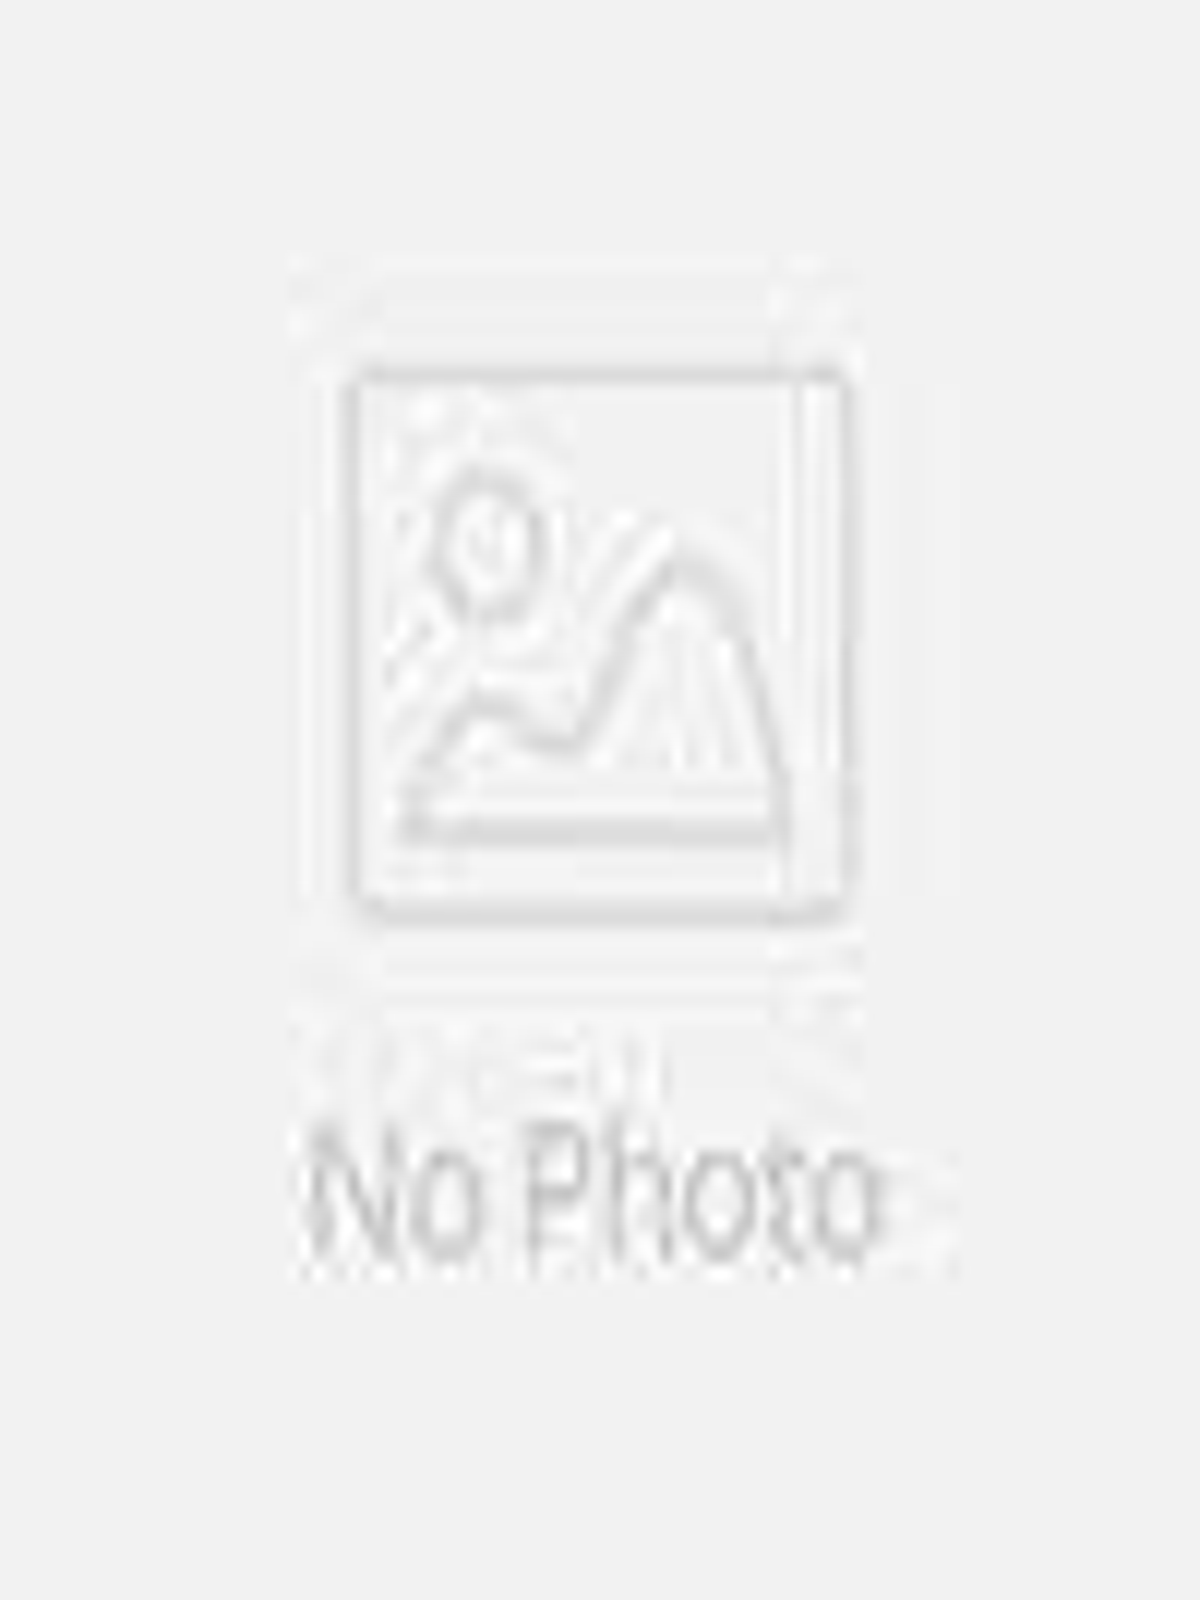 Unique Wedding Dress Designers - Wedding Dresses